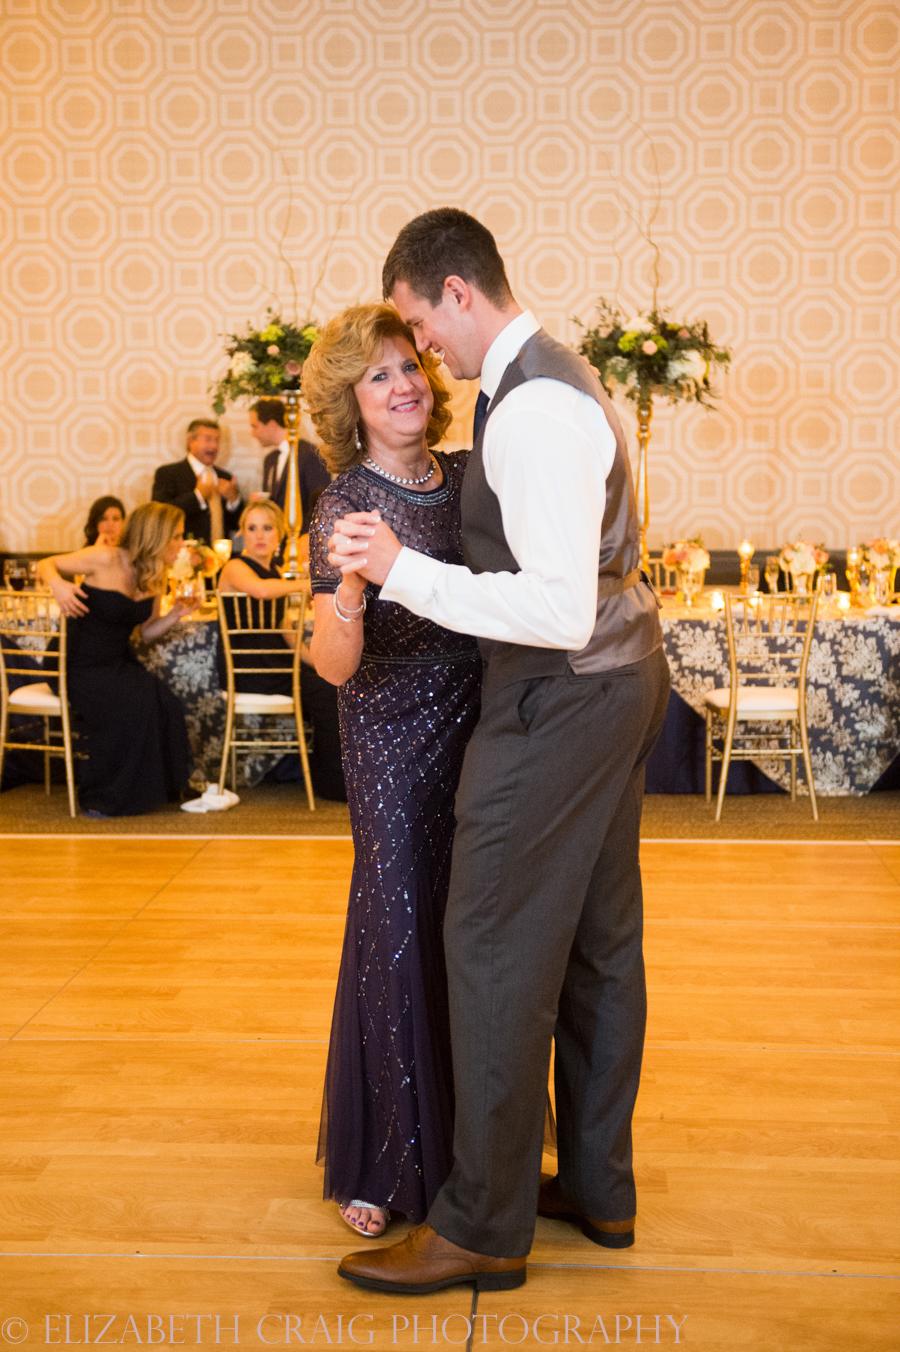 pittsburgh-greek-weddings-fairmont-weddings-receptions-elizabeth-craig-photohgraphy-030